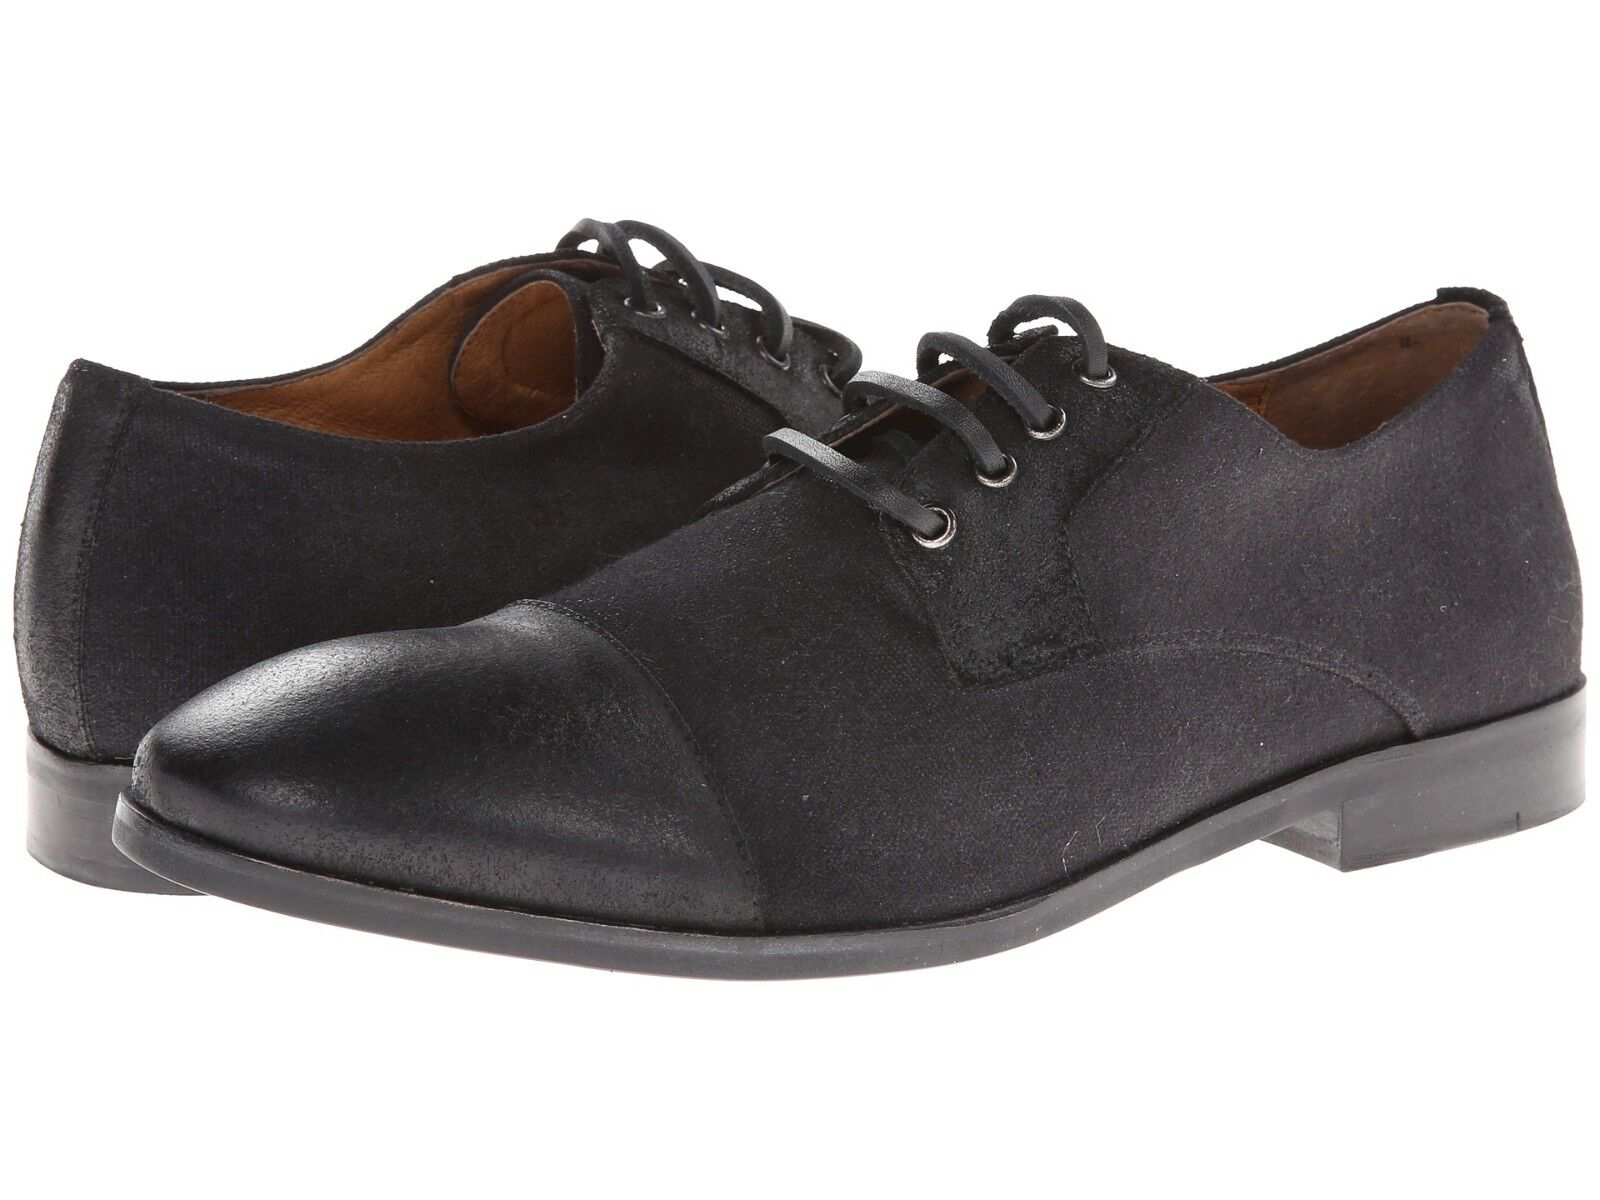 Kenneth Cole New York Comp-osition Men's Lace Up Cap Toe Shoes